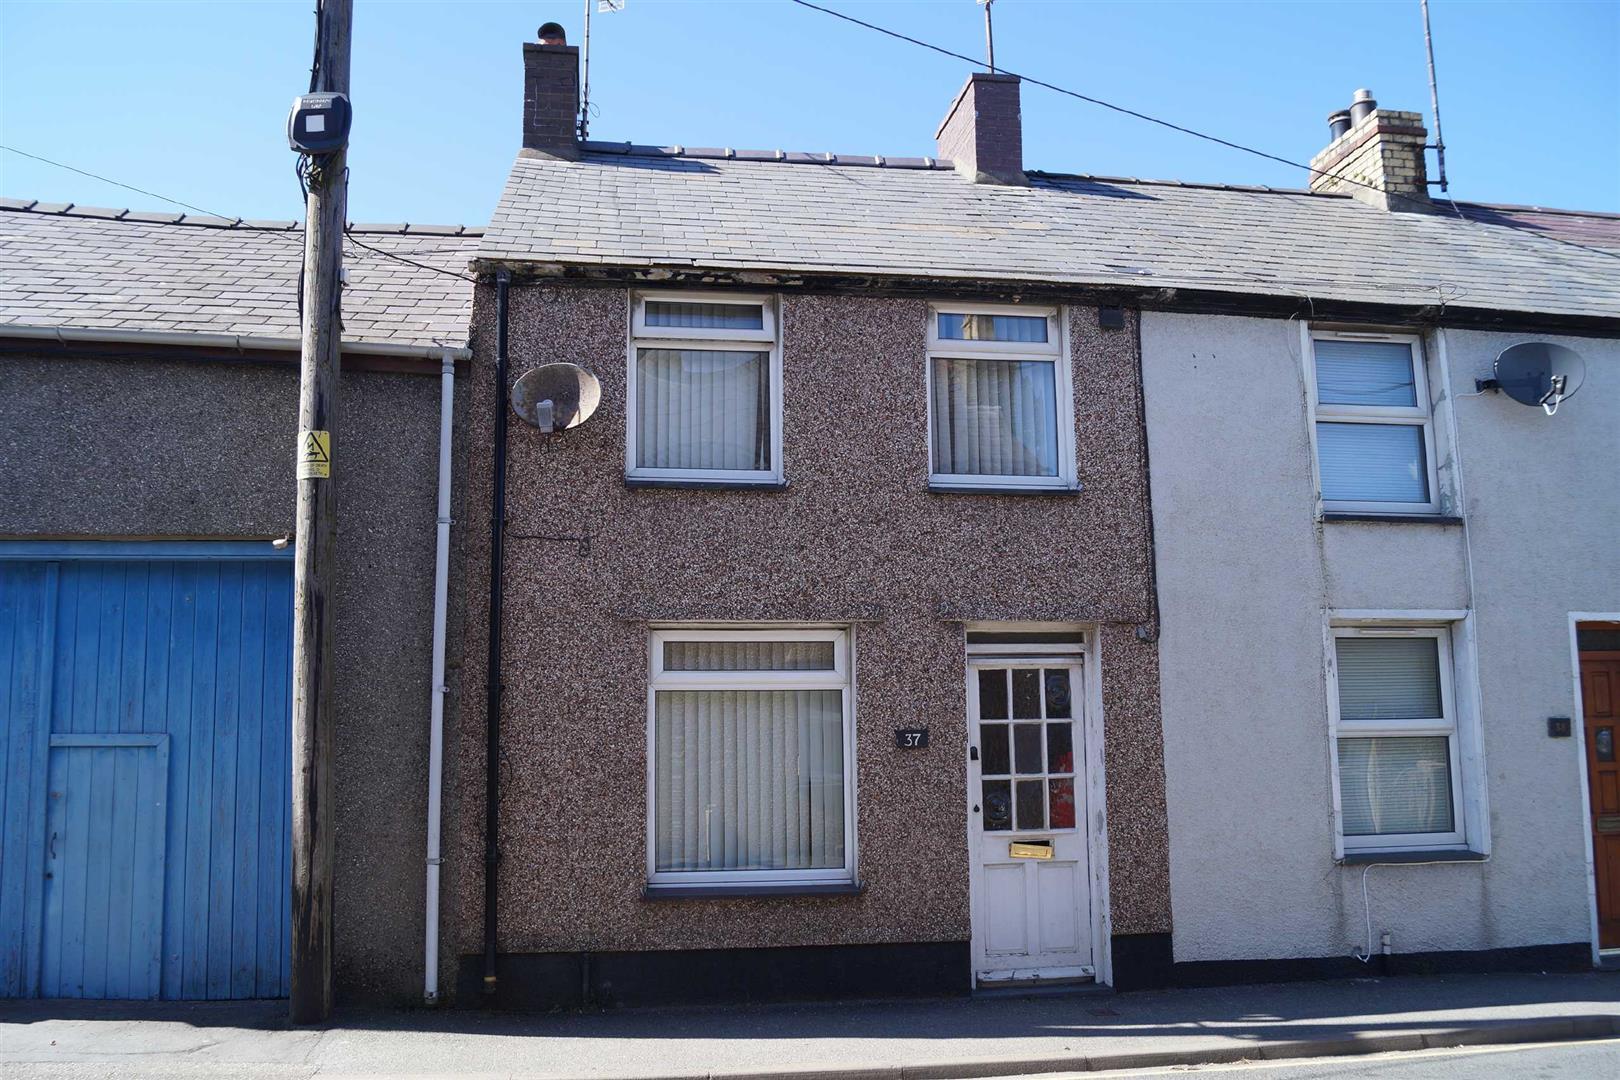 New Row, Pwllheli - £126,500/Realistic offers considered